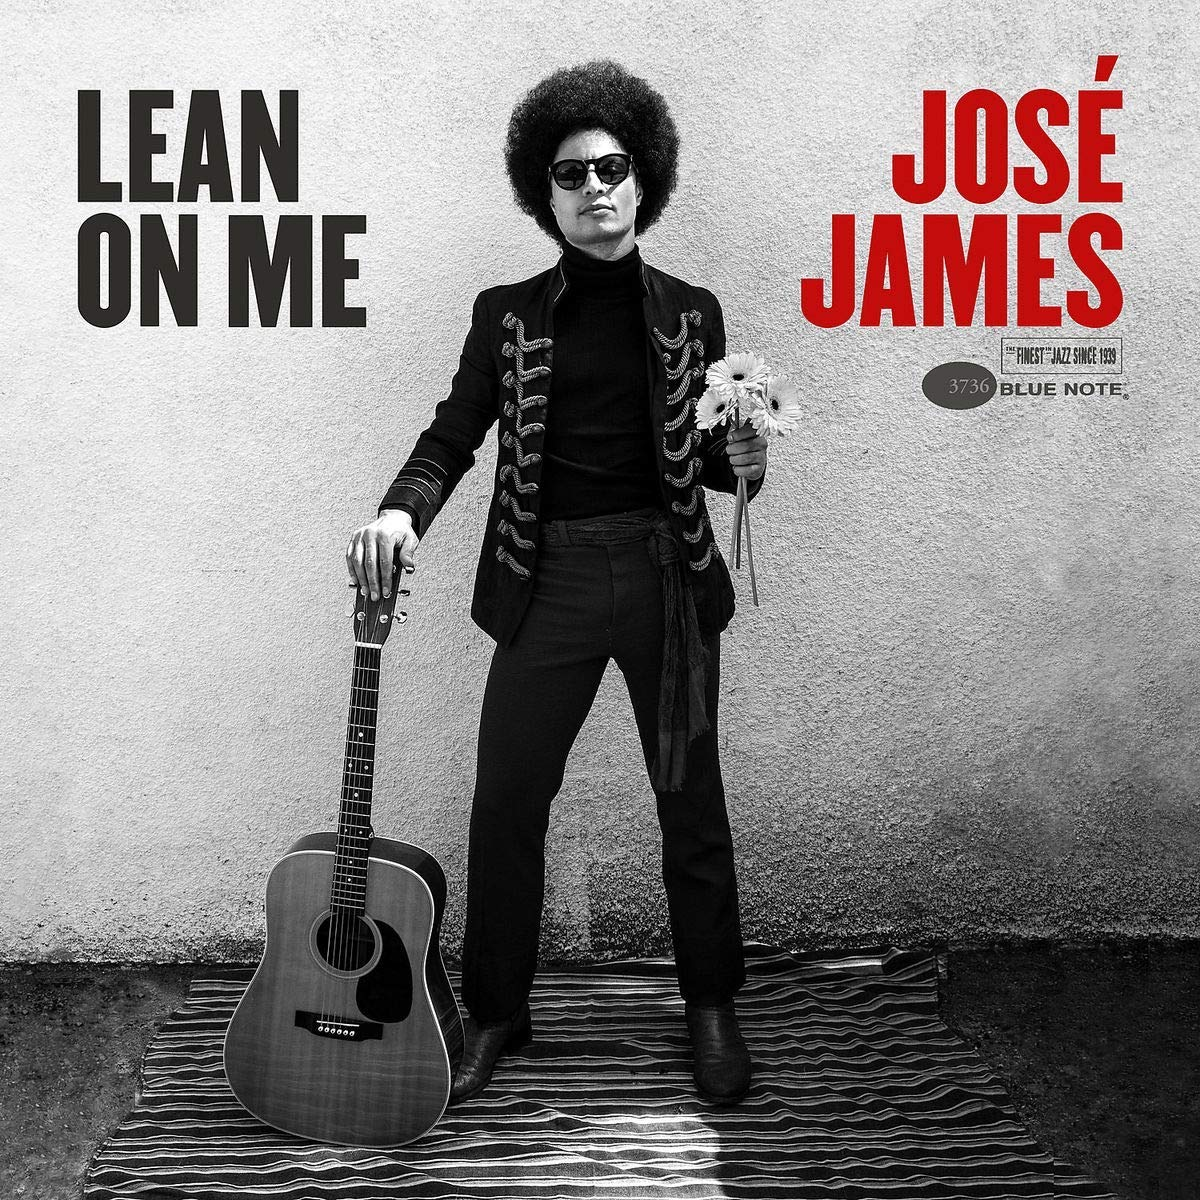 Хосе Джеймс Jose James. Lean On Me (LP) jools holland jose feliciano jools holland jose feliciano as you see me now 180 gr